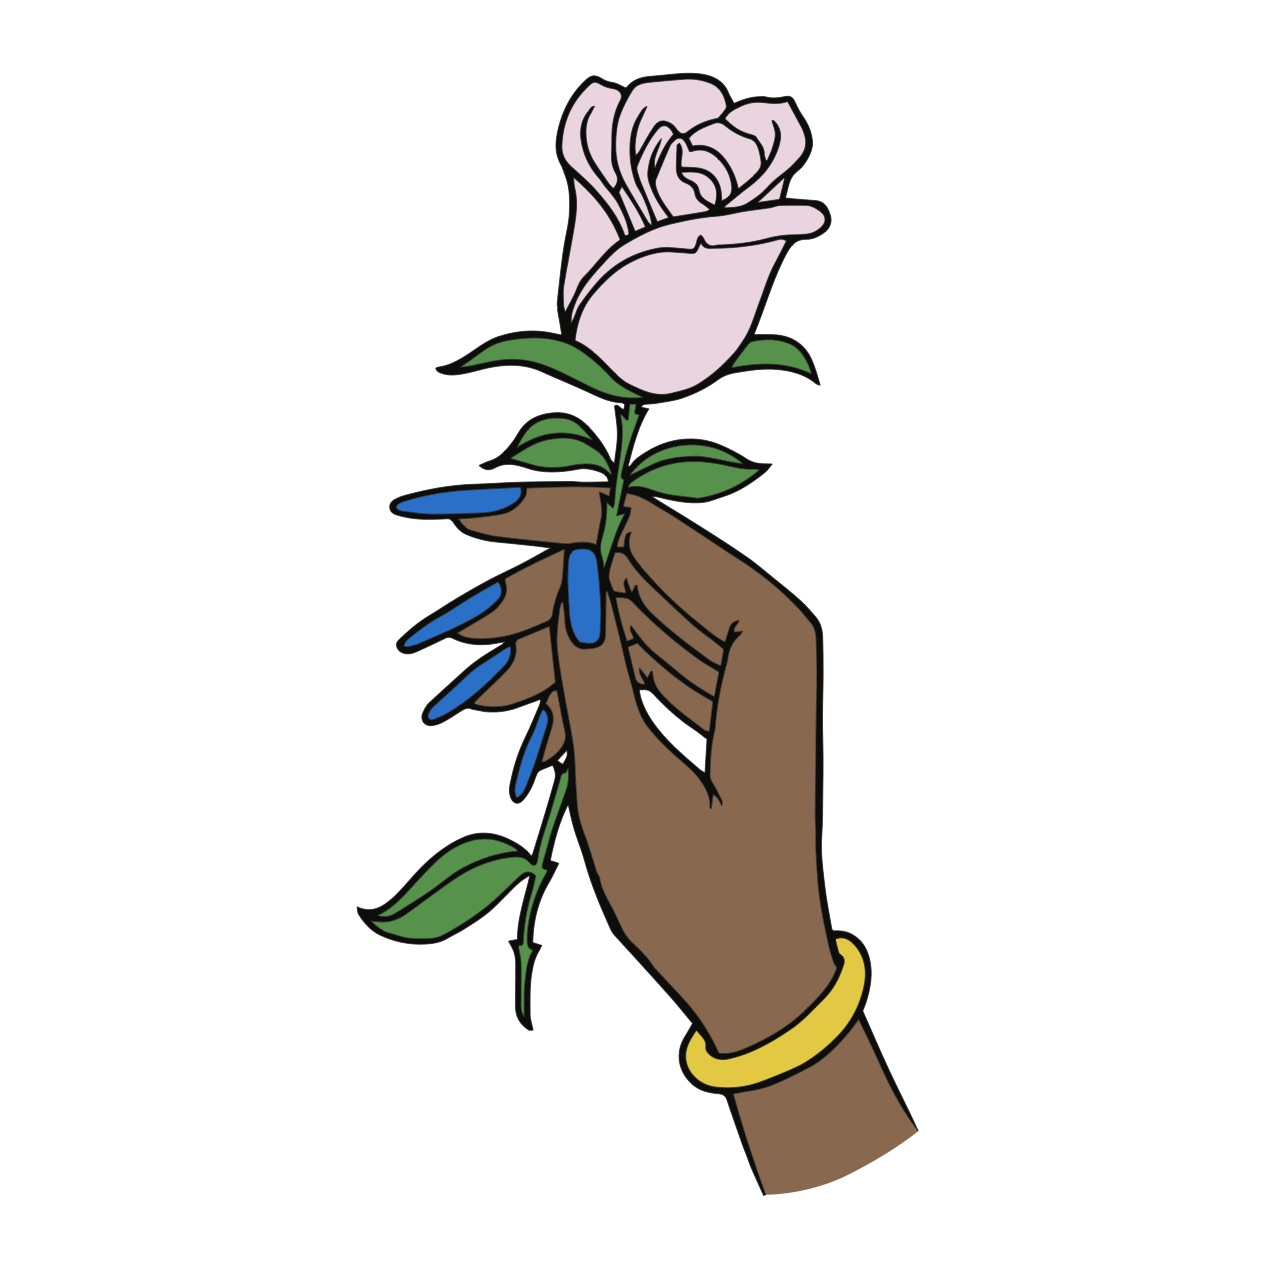 HAND & ROSE